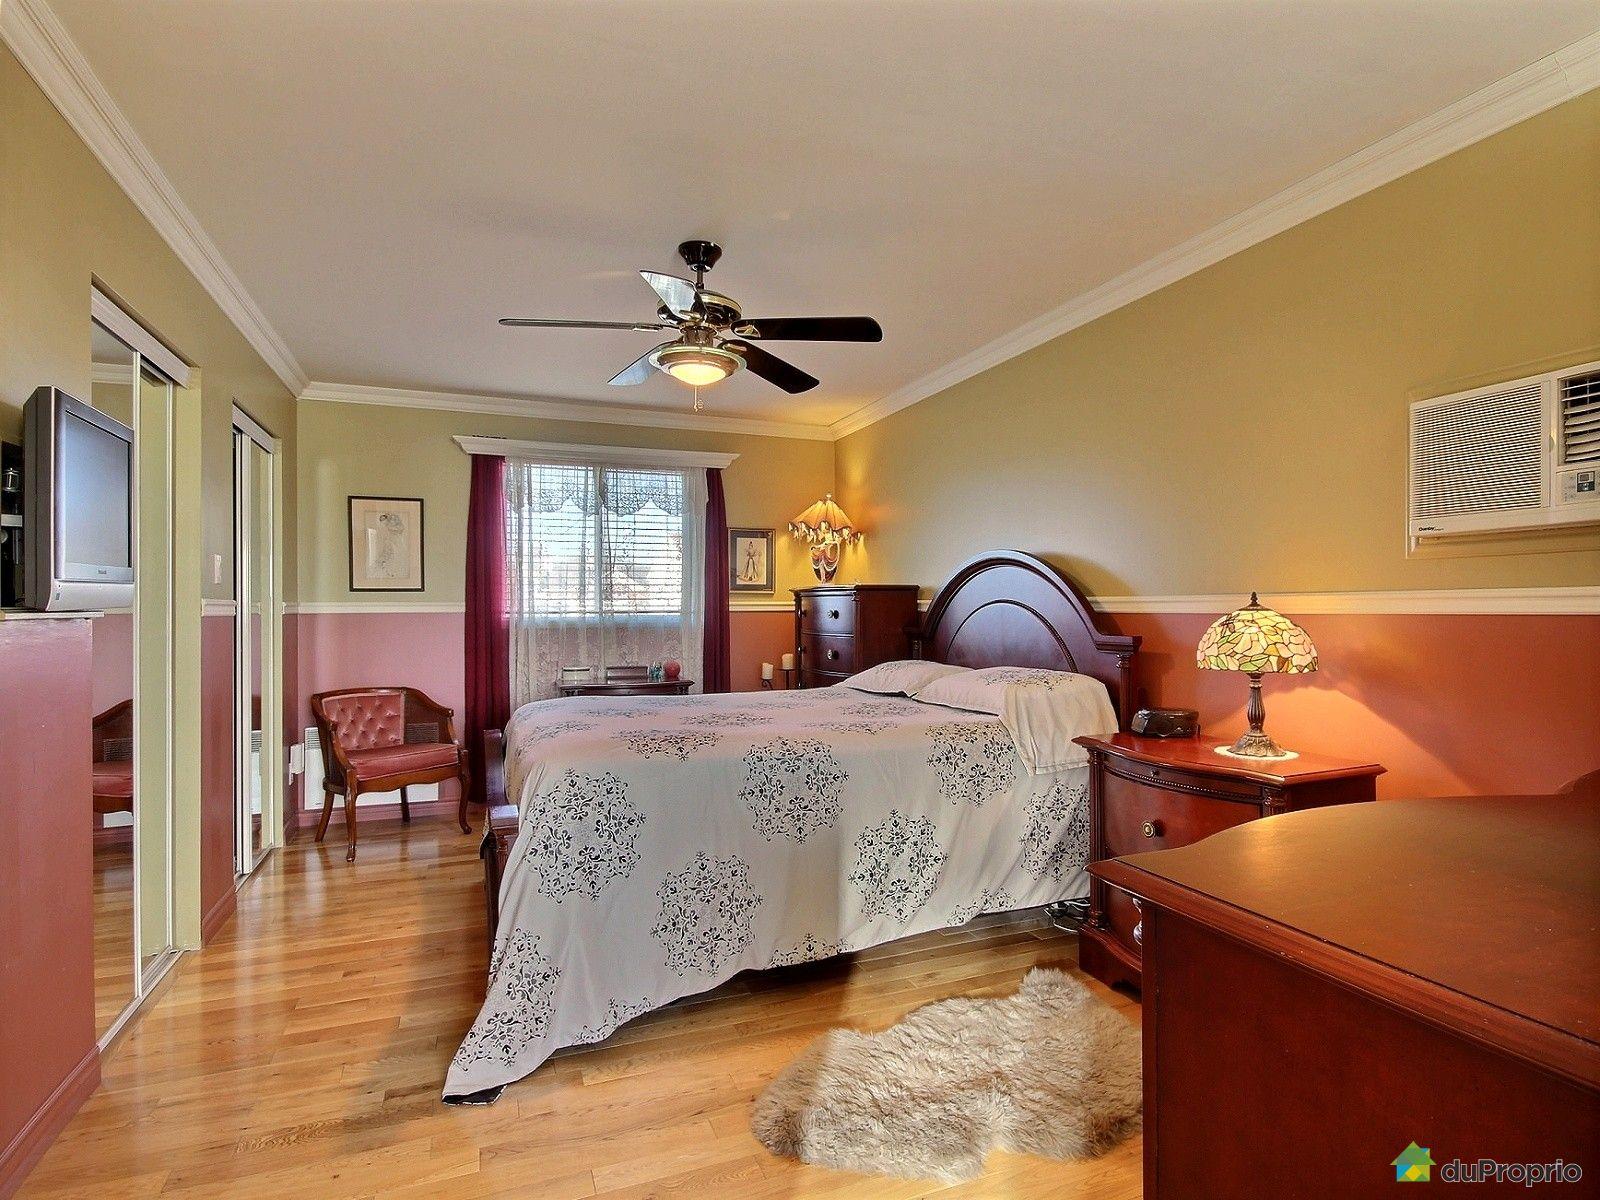 Maison vendre mirabel 13995 rue omer paquette for Chambre de commerce mirabel